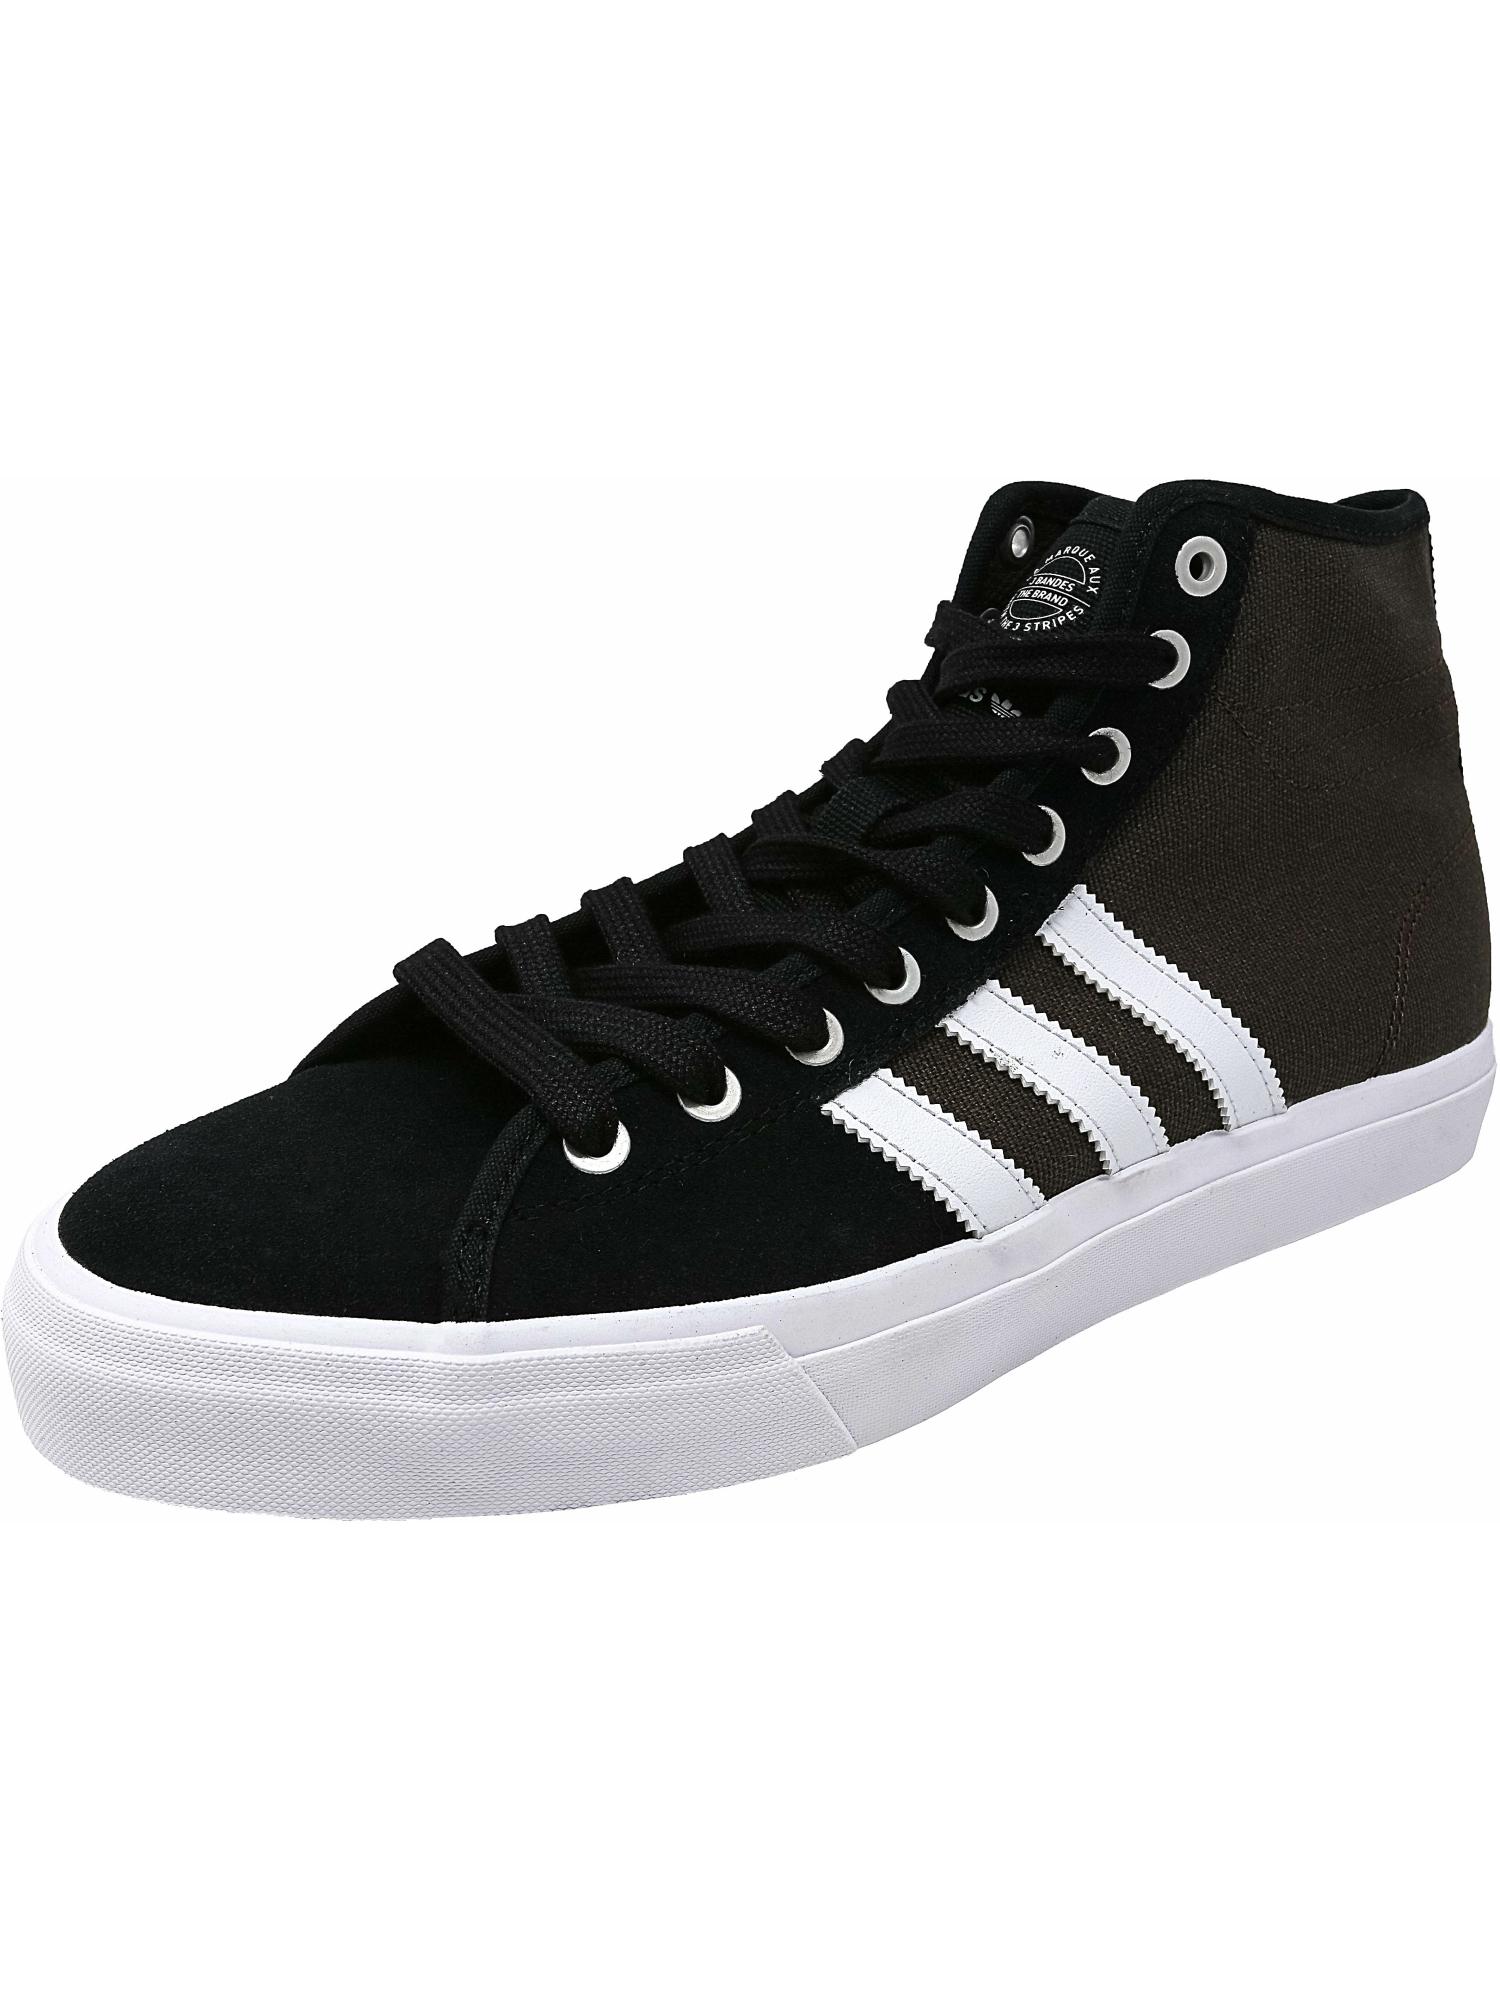 Adidas hommes Matchcourt High Rx Ankle-High Fabric Fabric Fabric Fashion Sneaker b81386